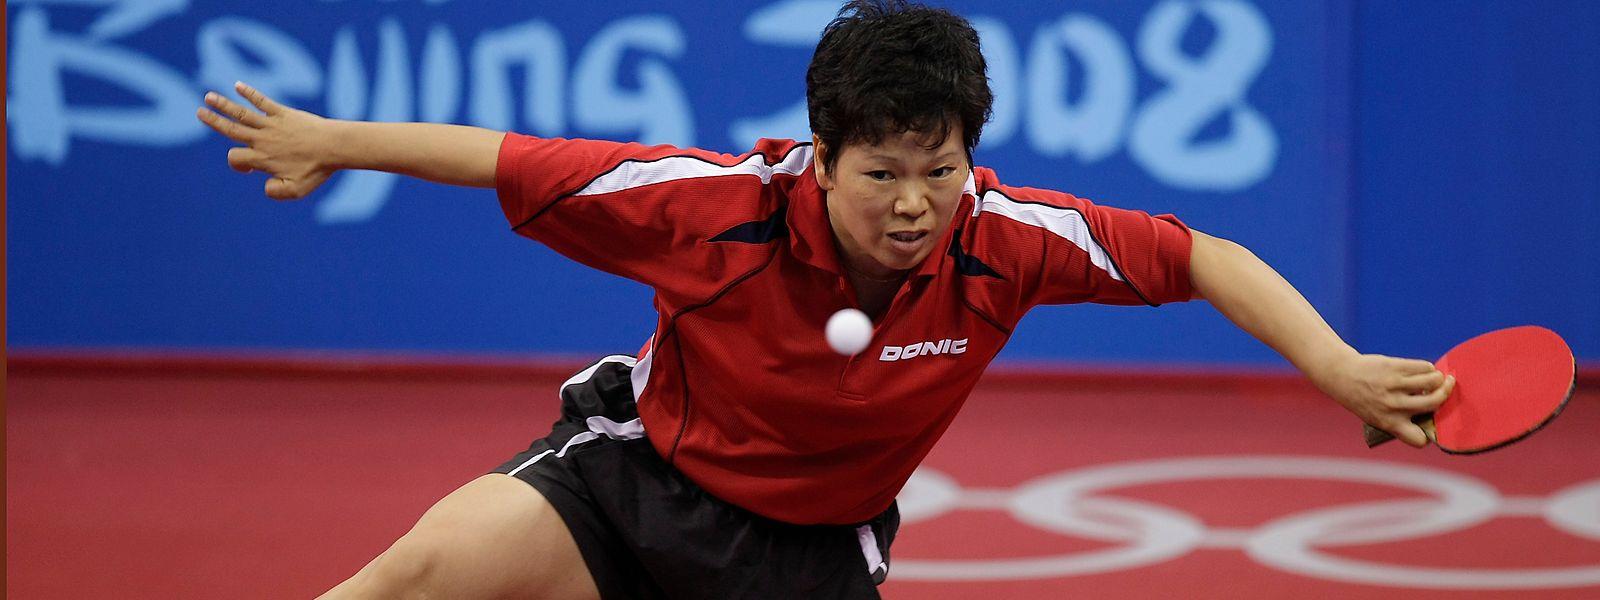 Ni Xia Lian prendra part aux Jeux olympiques de Tokyo en 2020